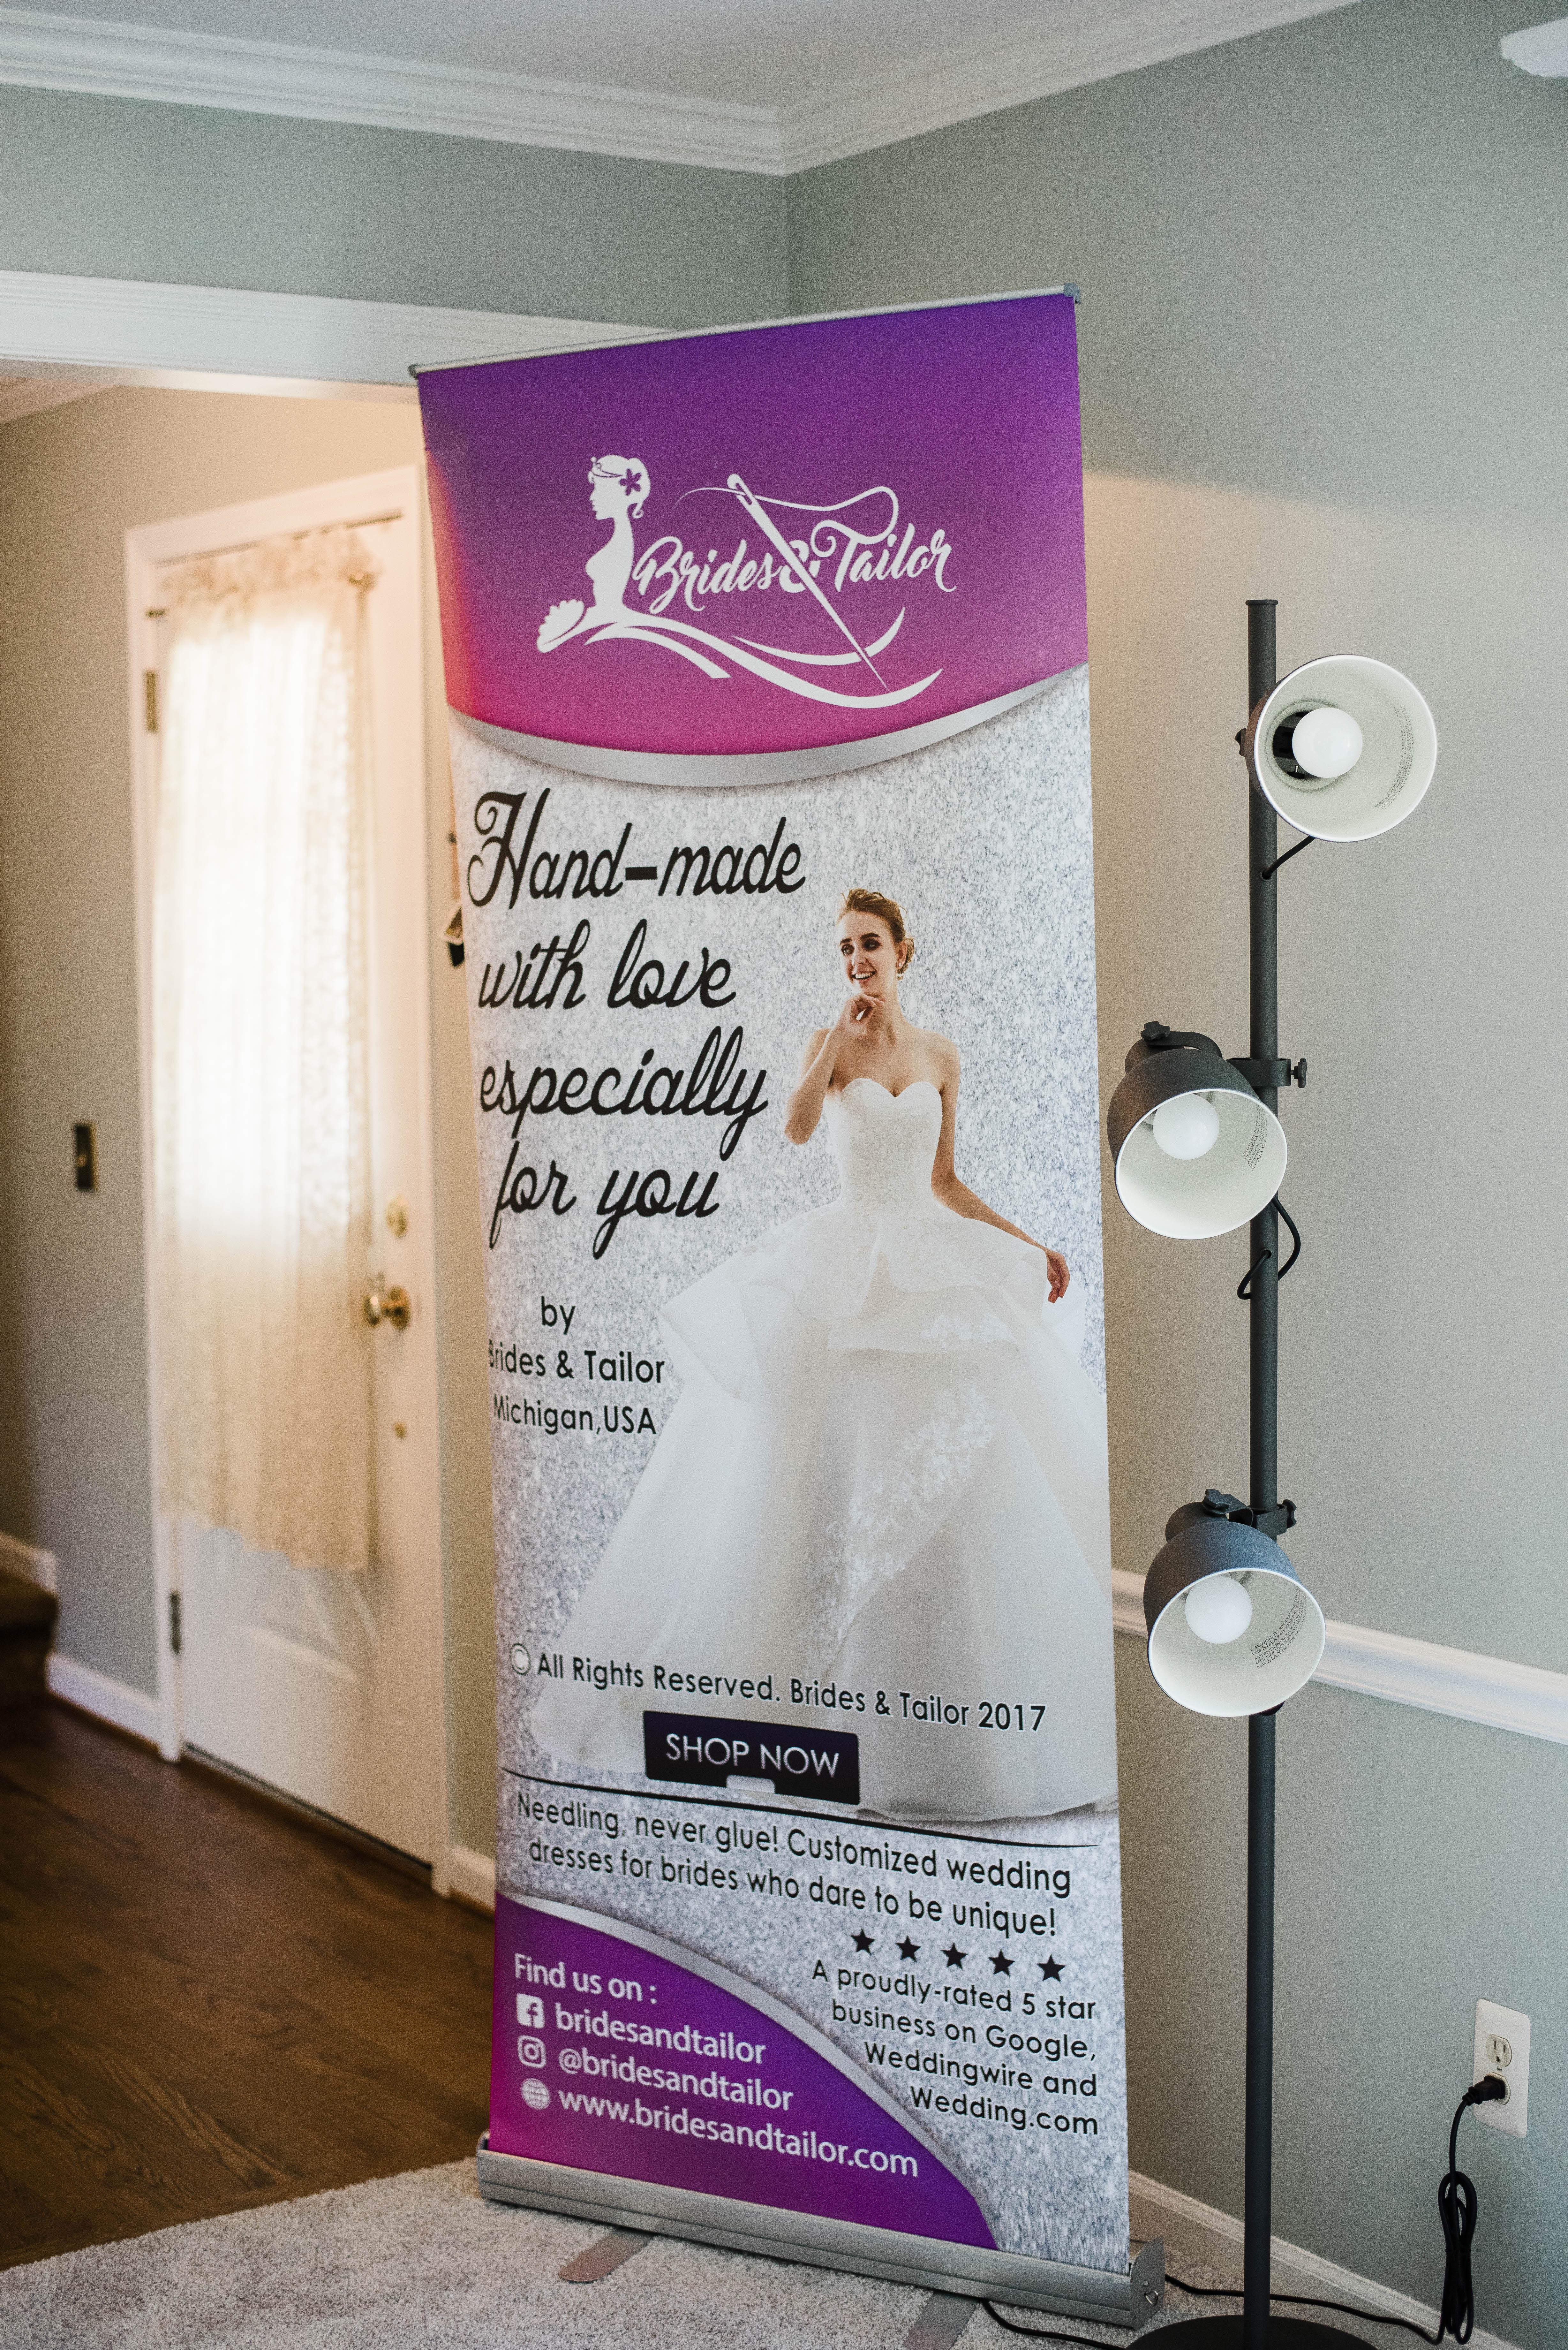 Brides & Tailor's Michigan photoshoot